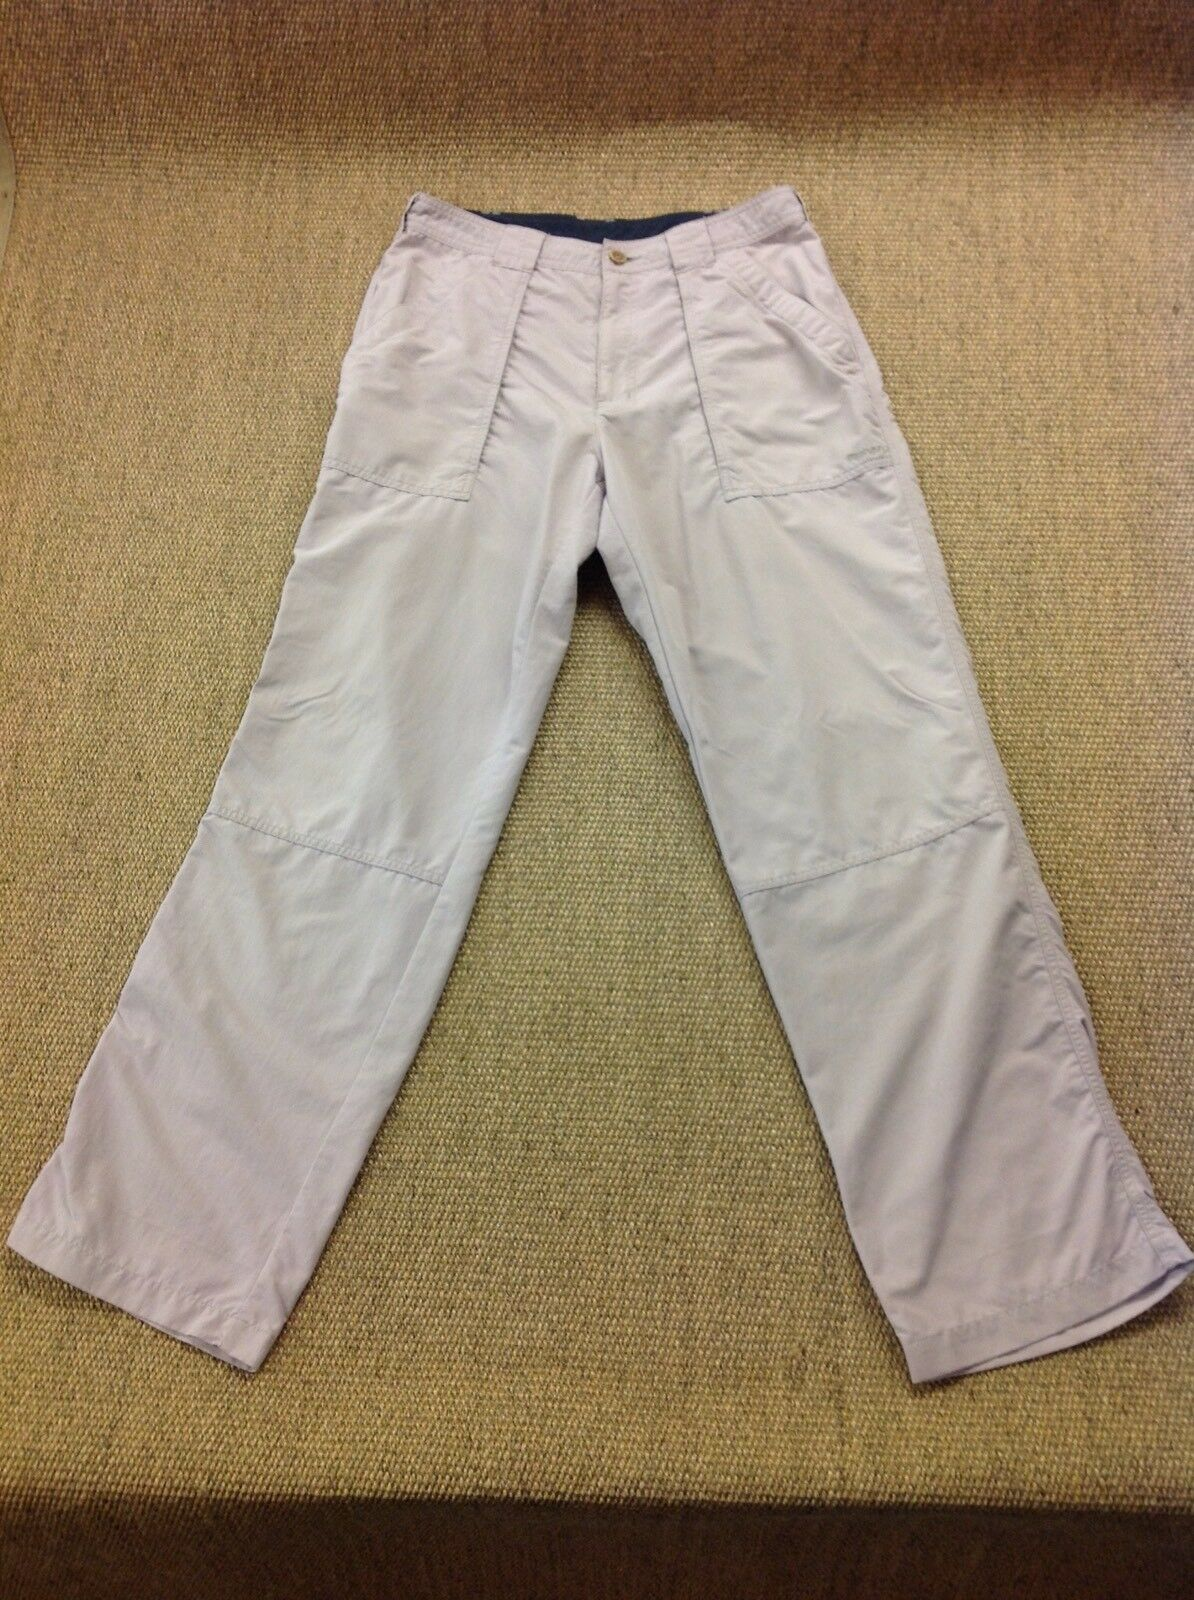 Men's ROHAN W32-34 L32.5 Fusion Beige Walking Trousers. Superb